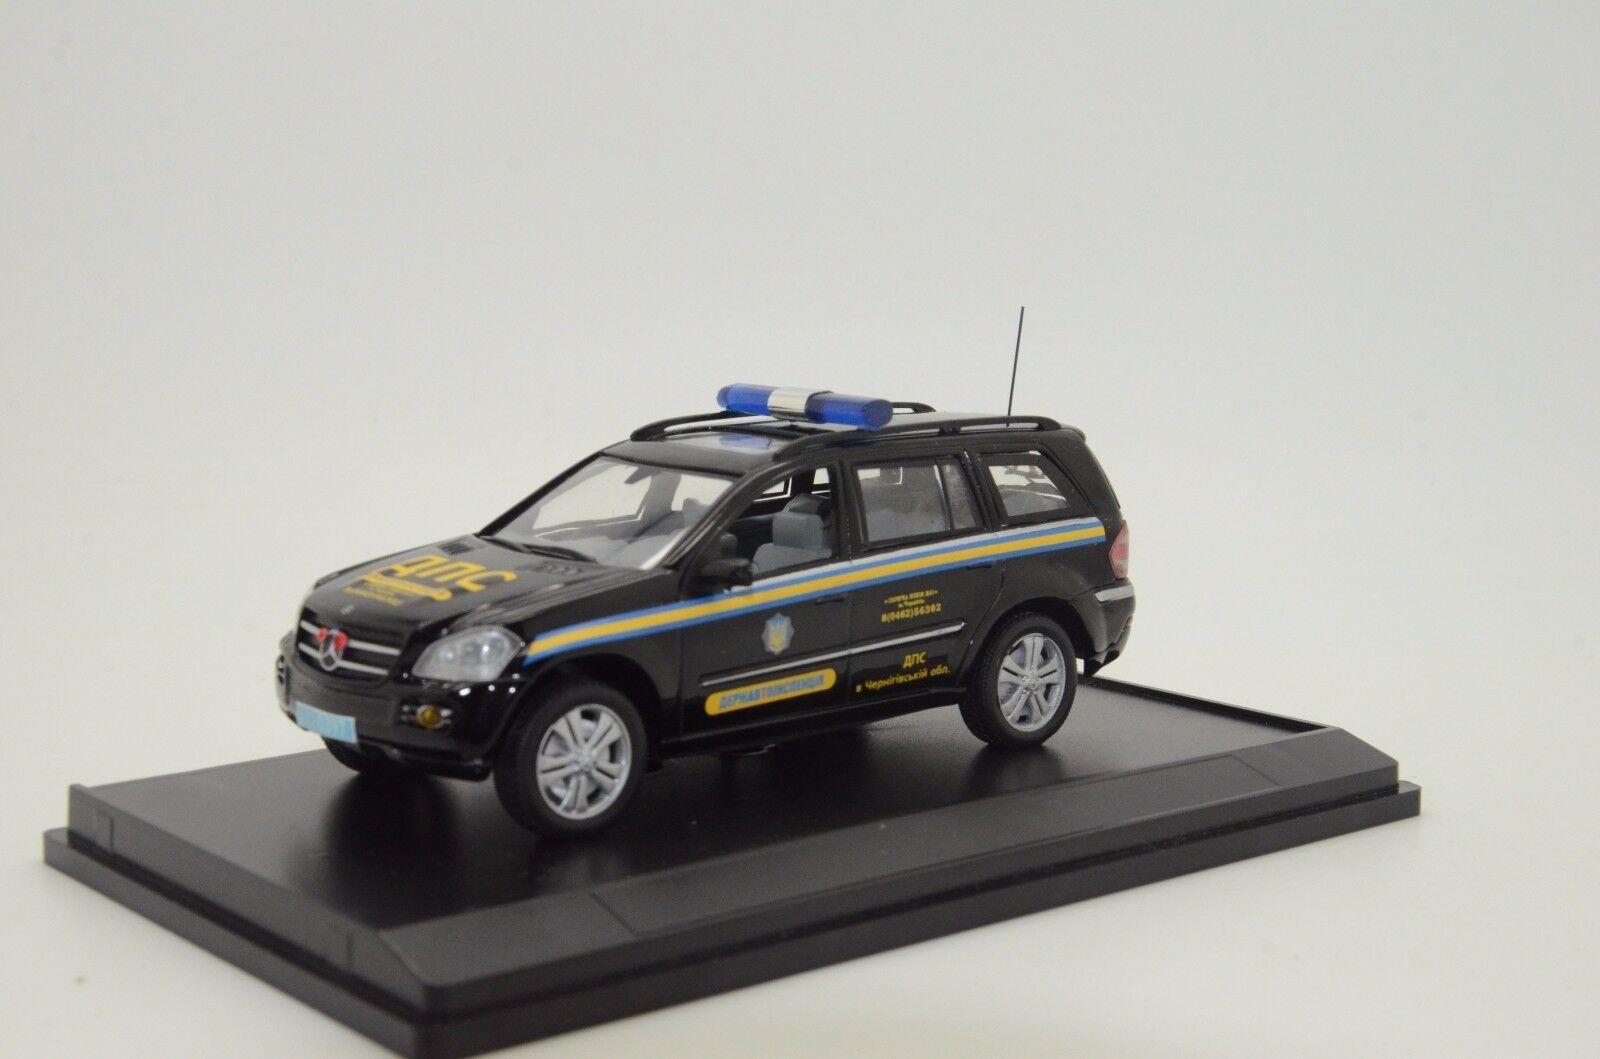 rara Mercedes CLK Ucrania carretera policía coche hecho a medida 1/43